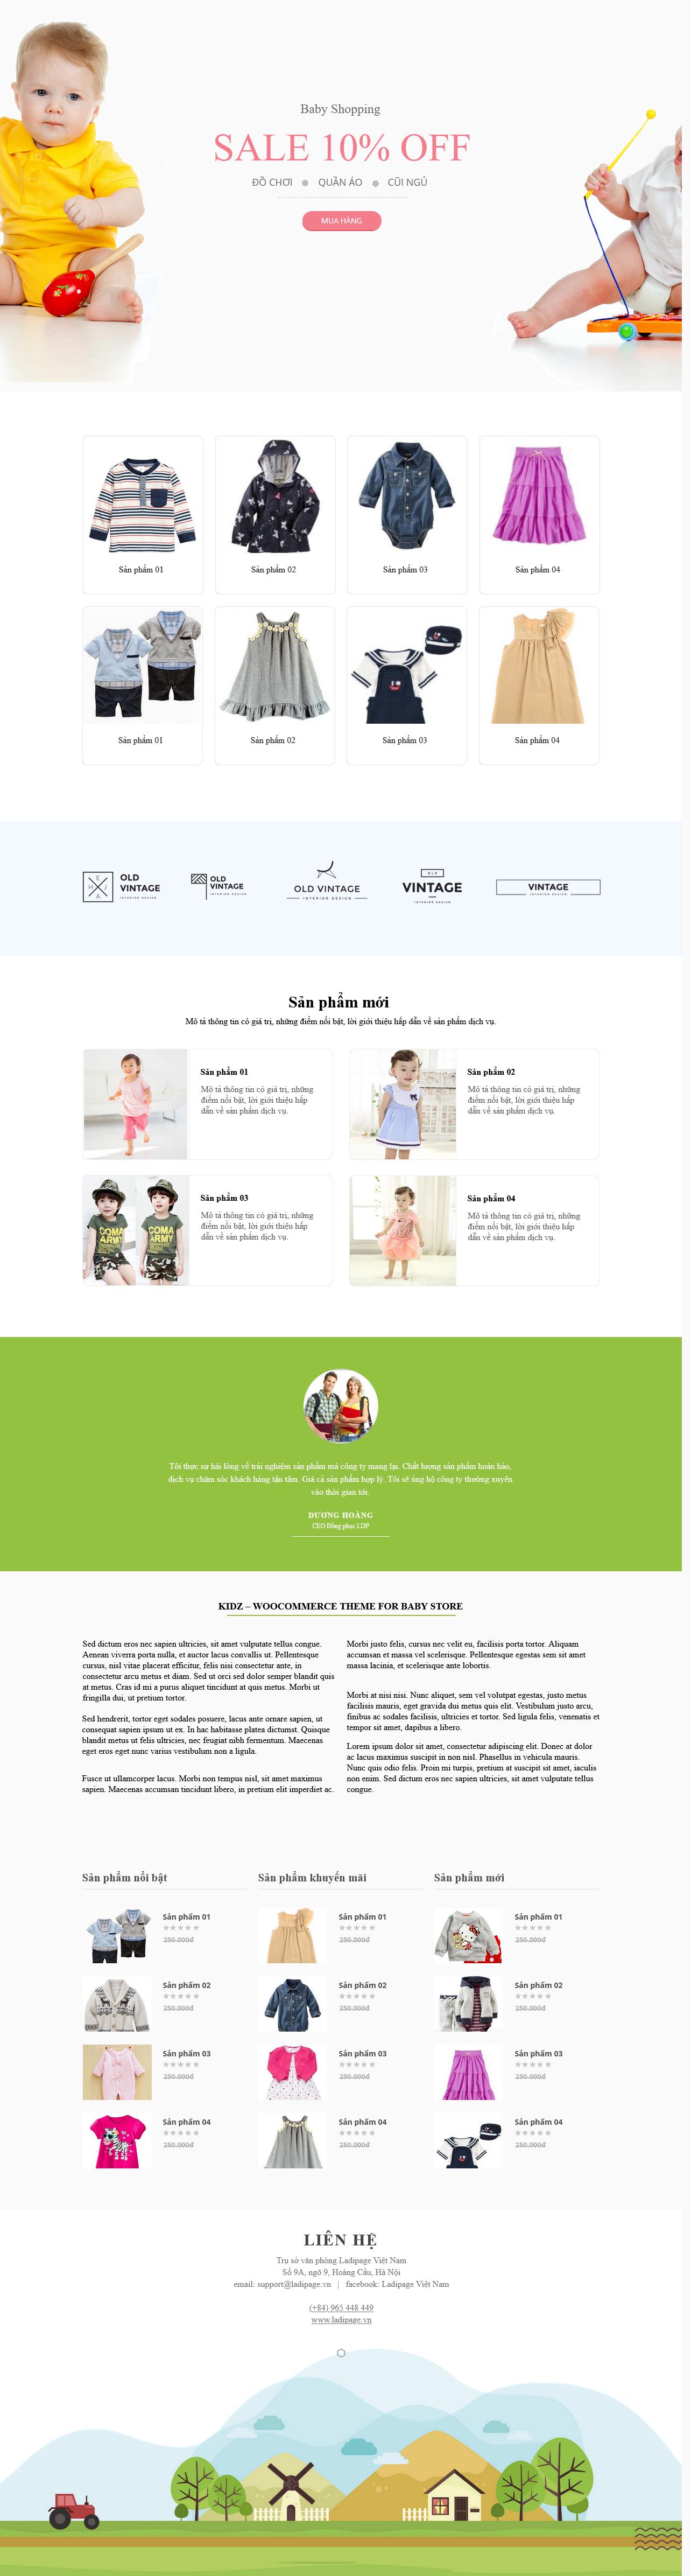 Thiết kế website Thiết kế webiste landingpage me---be Mẹ & Bé 01